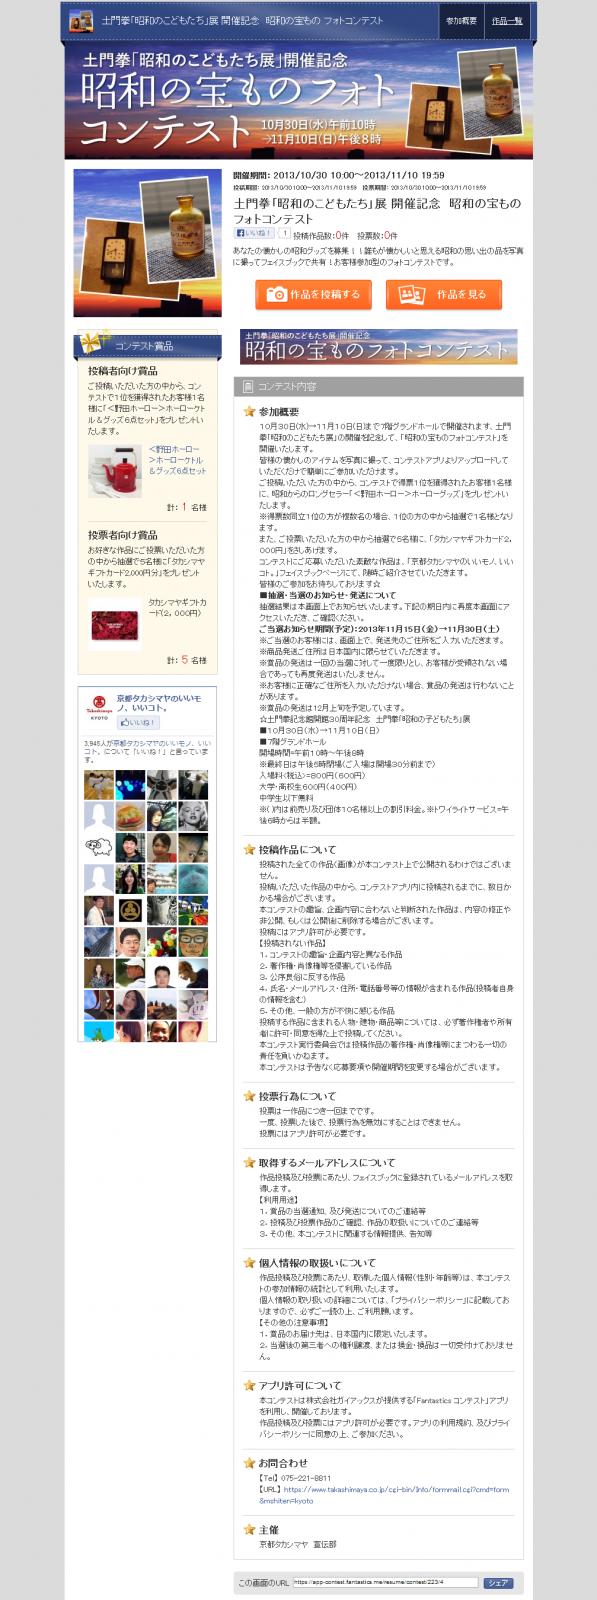 Fantastics 投稿&投票キャンペーンアプリ(株式会社高島屋様)